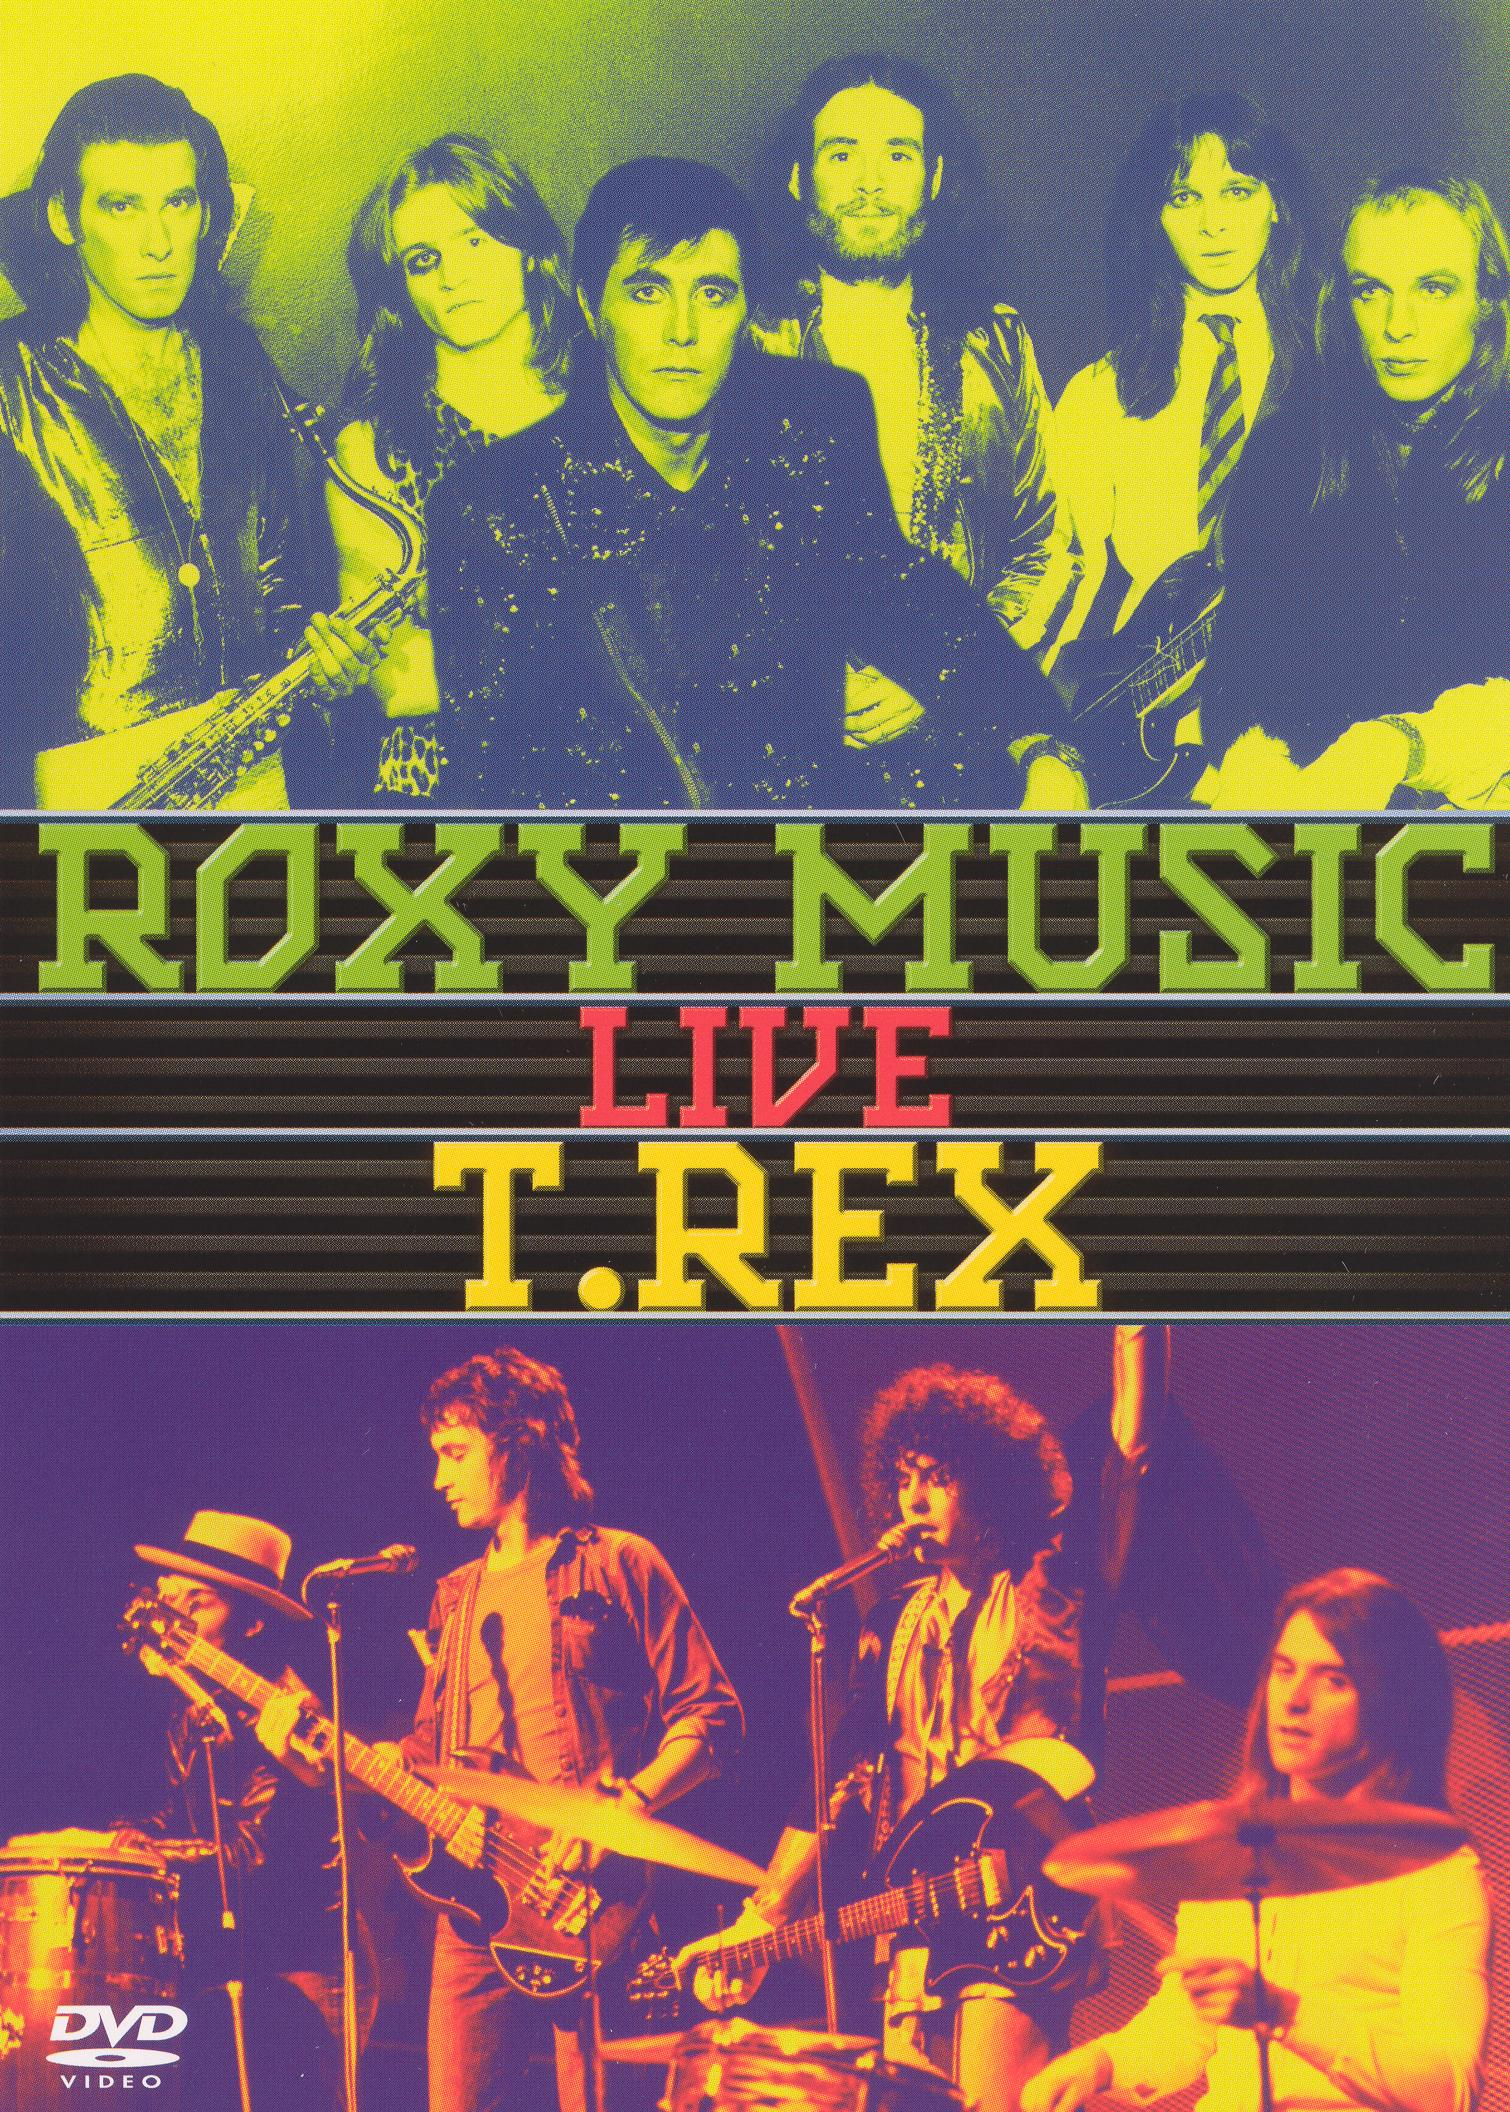 Roxy Music/T. Rex: Live